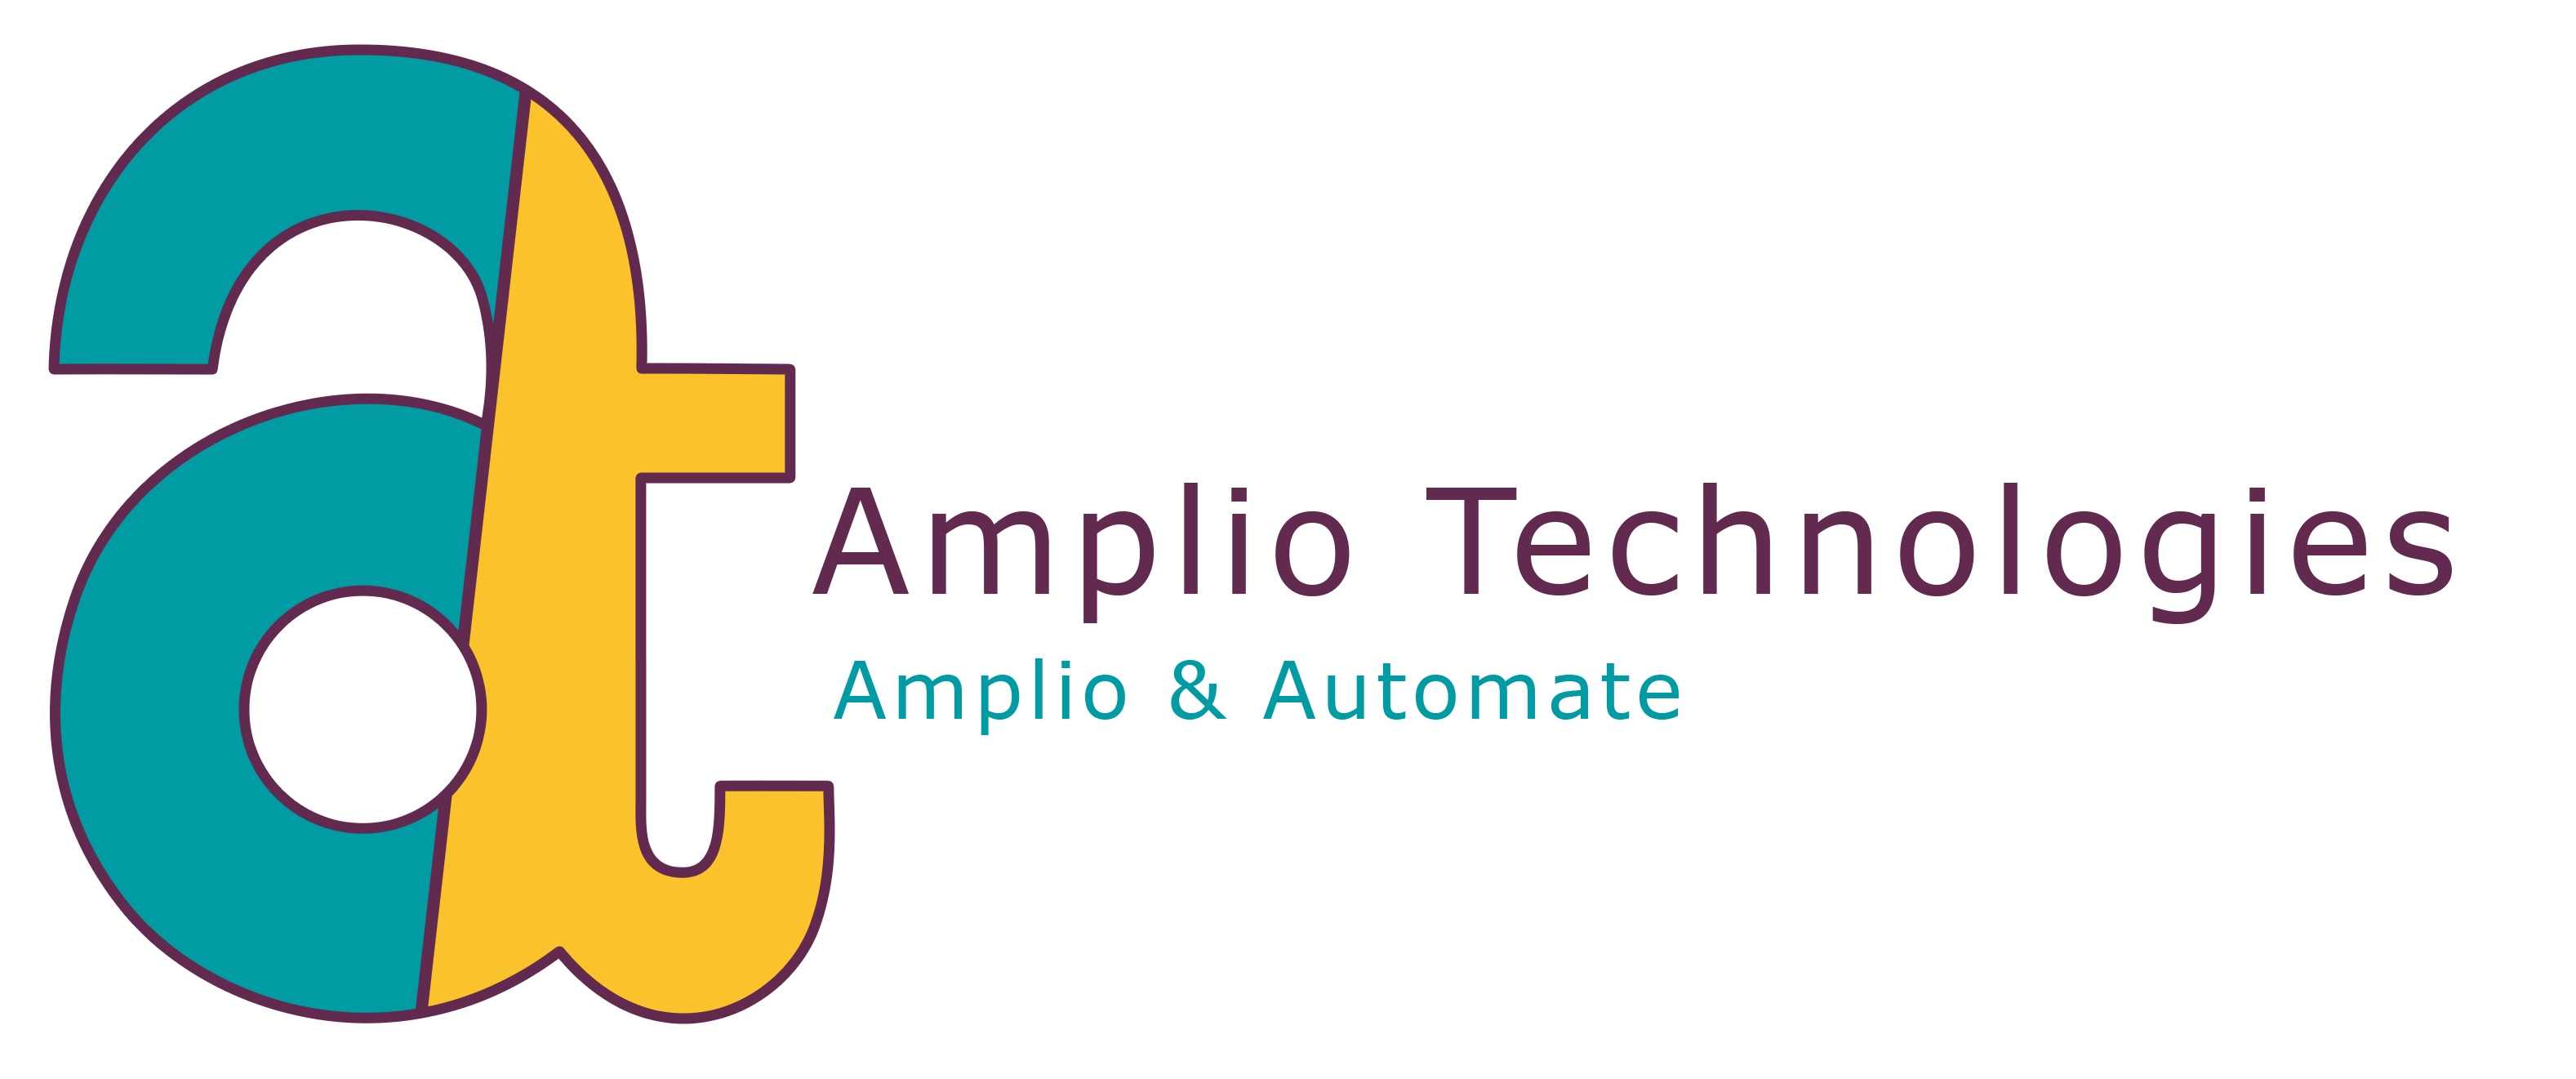 Amplio Technologies Logo